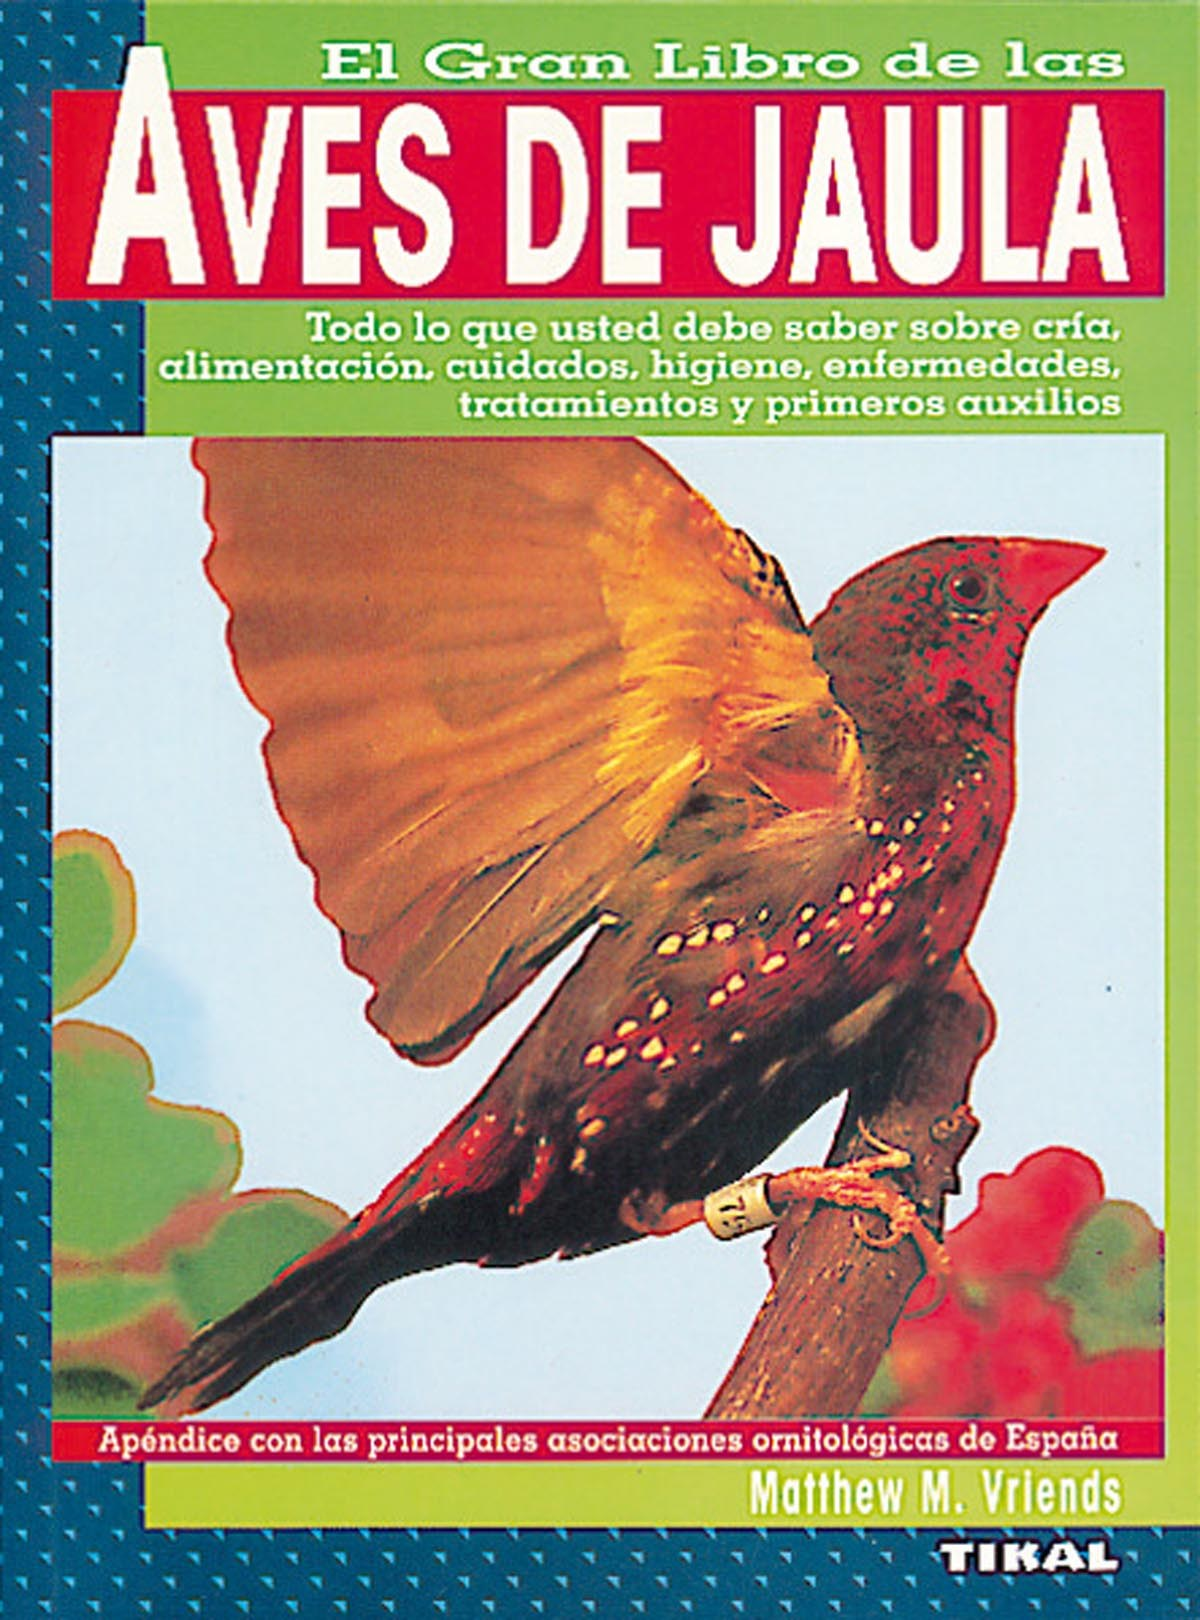 Aves de jaula. 9788430584932